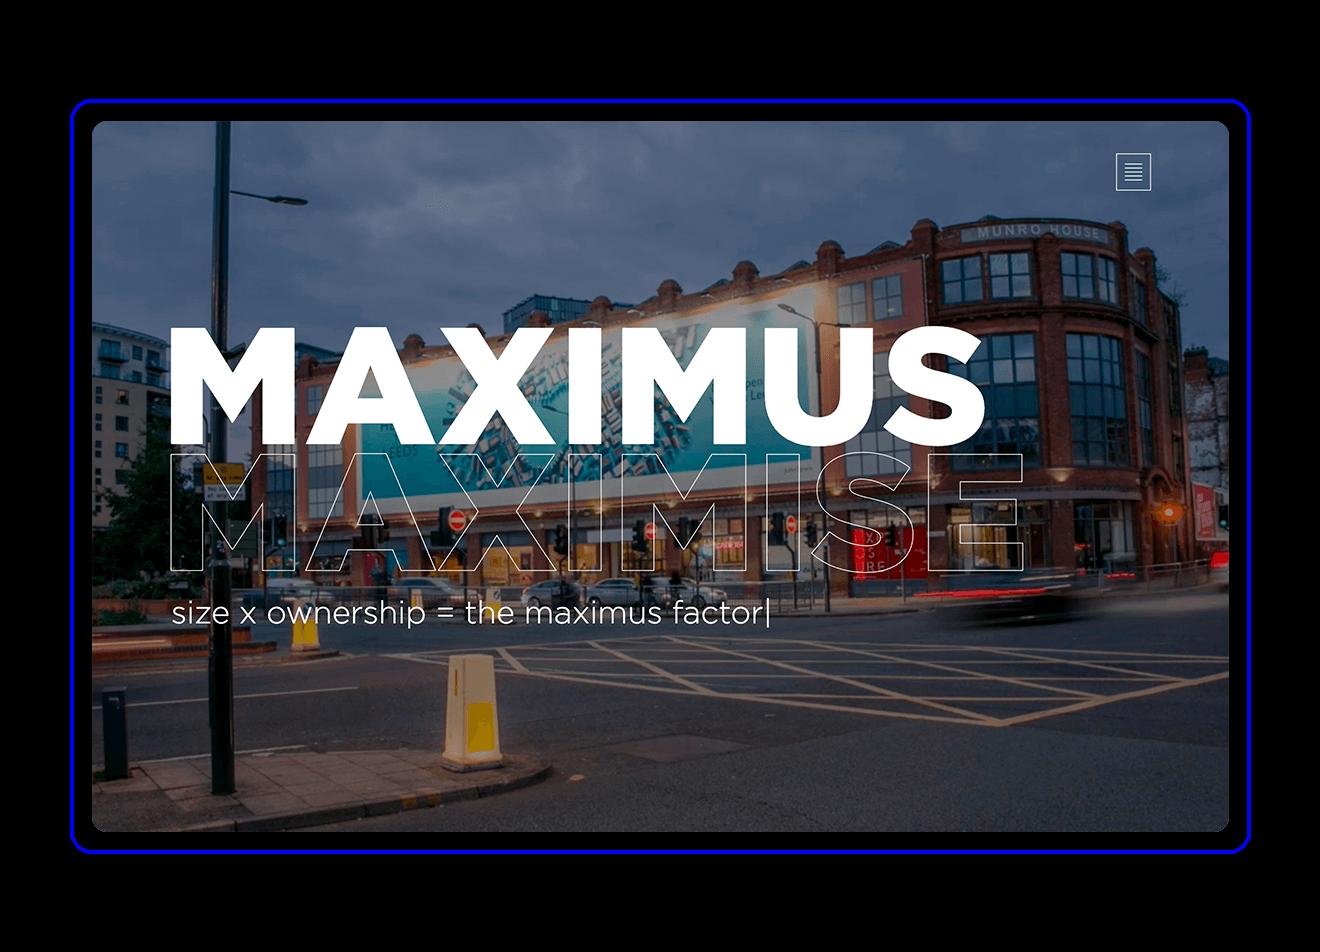 Maximus main page